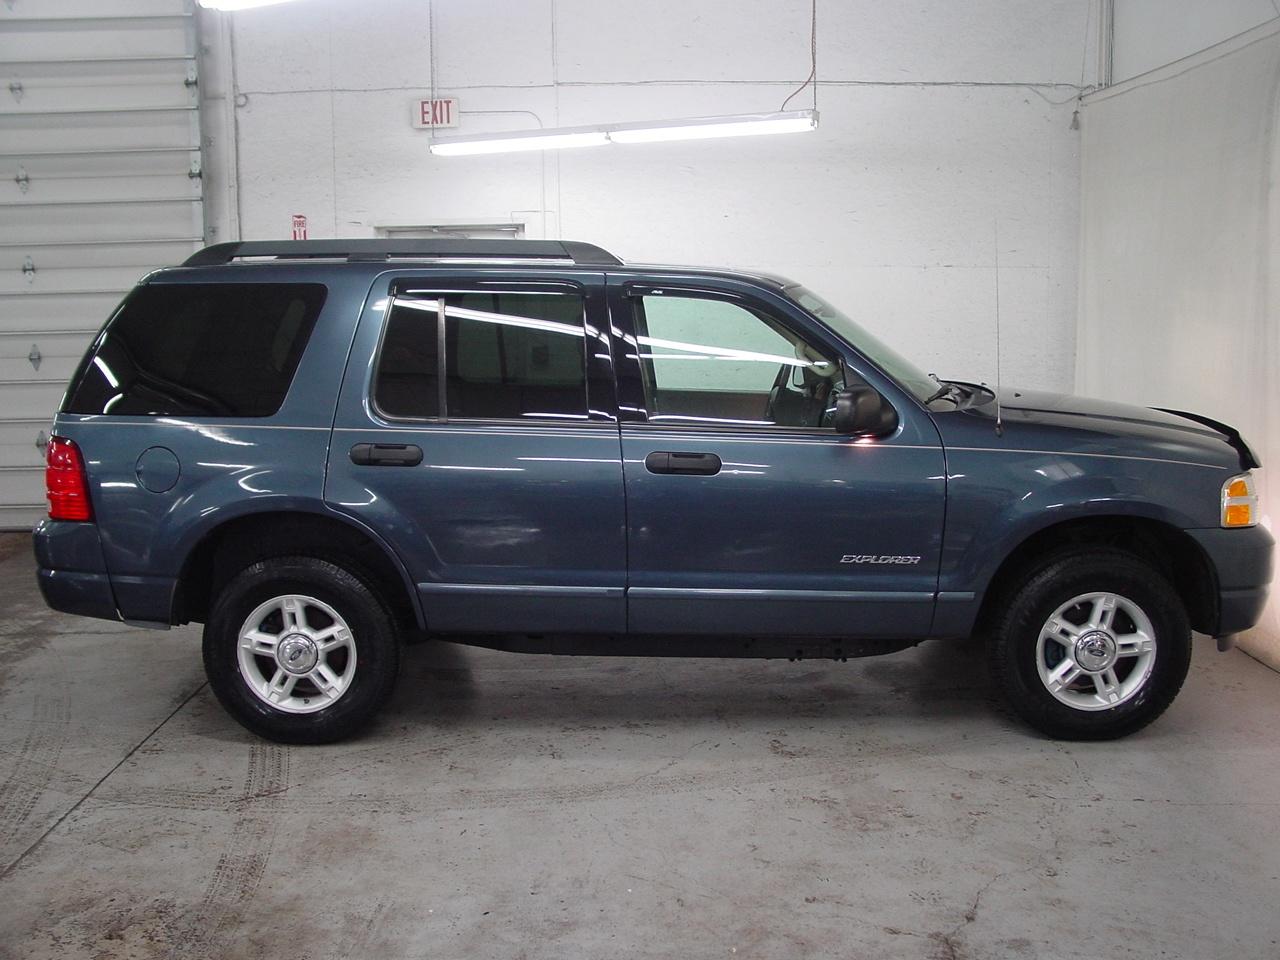 2005 ford explorer xlt biscayne auto sales pre owned dealership ontario ny. Black Bedroom Furniture Sets. Home Design Ideas